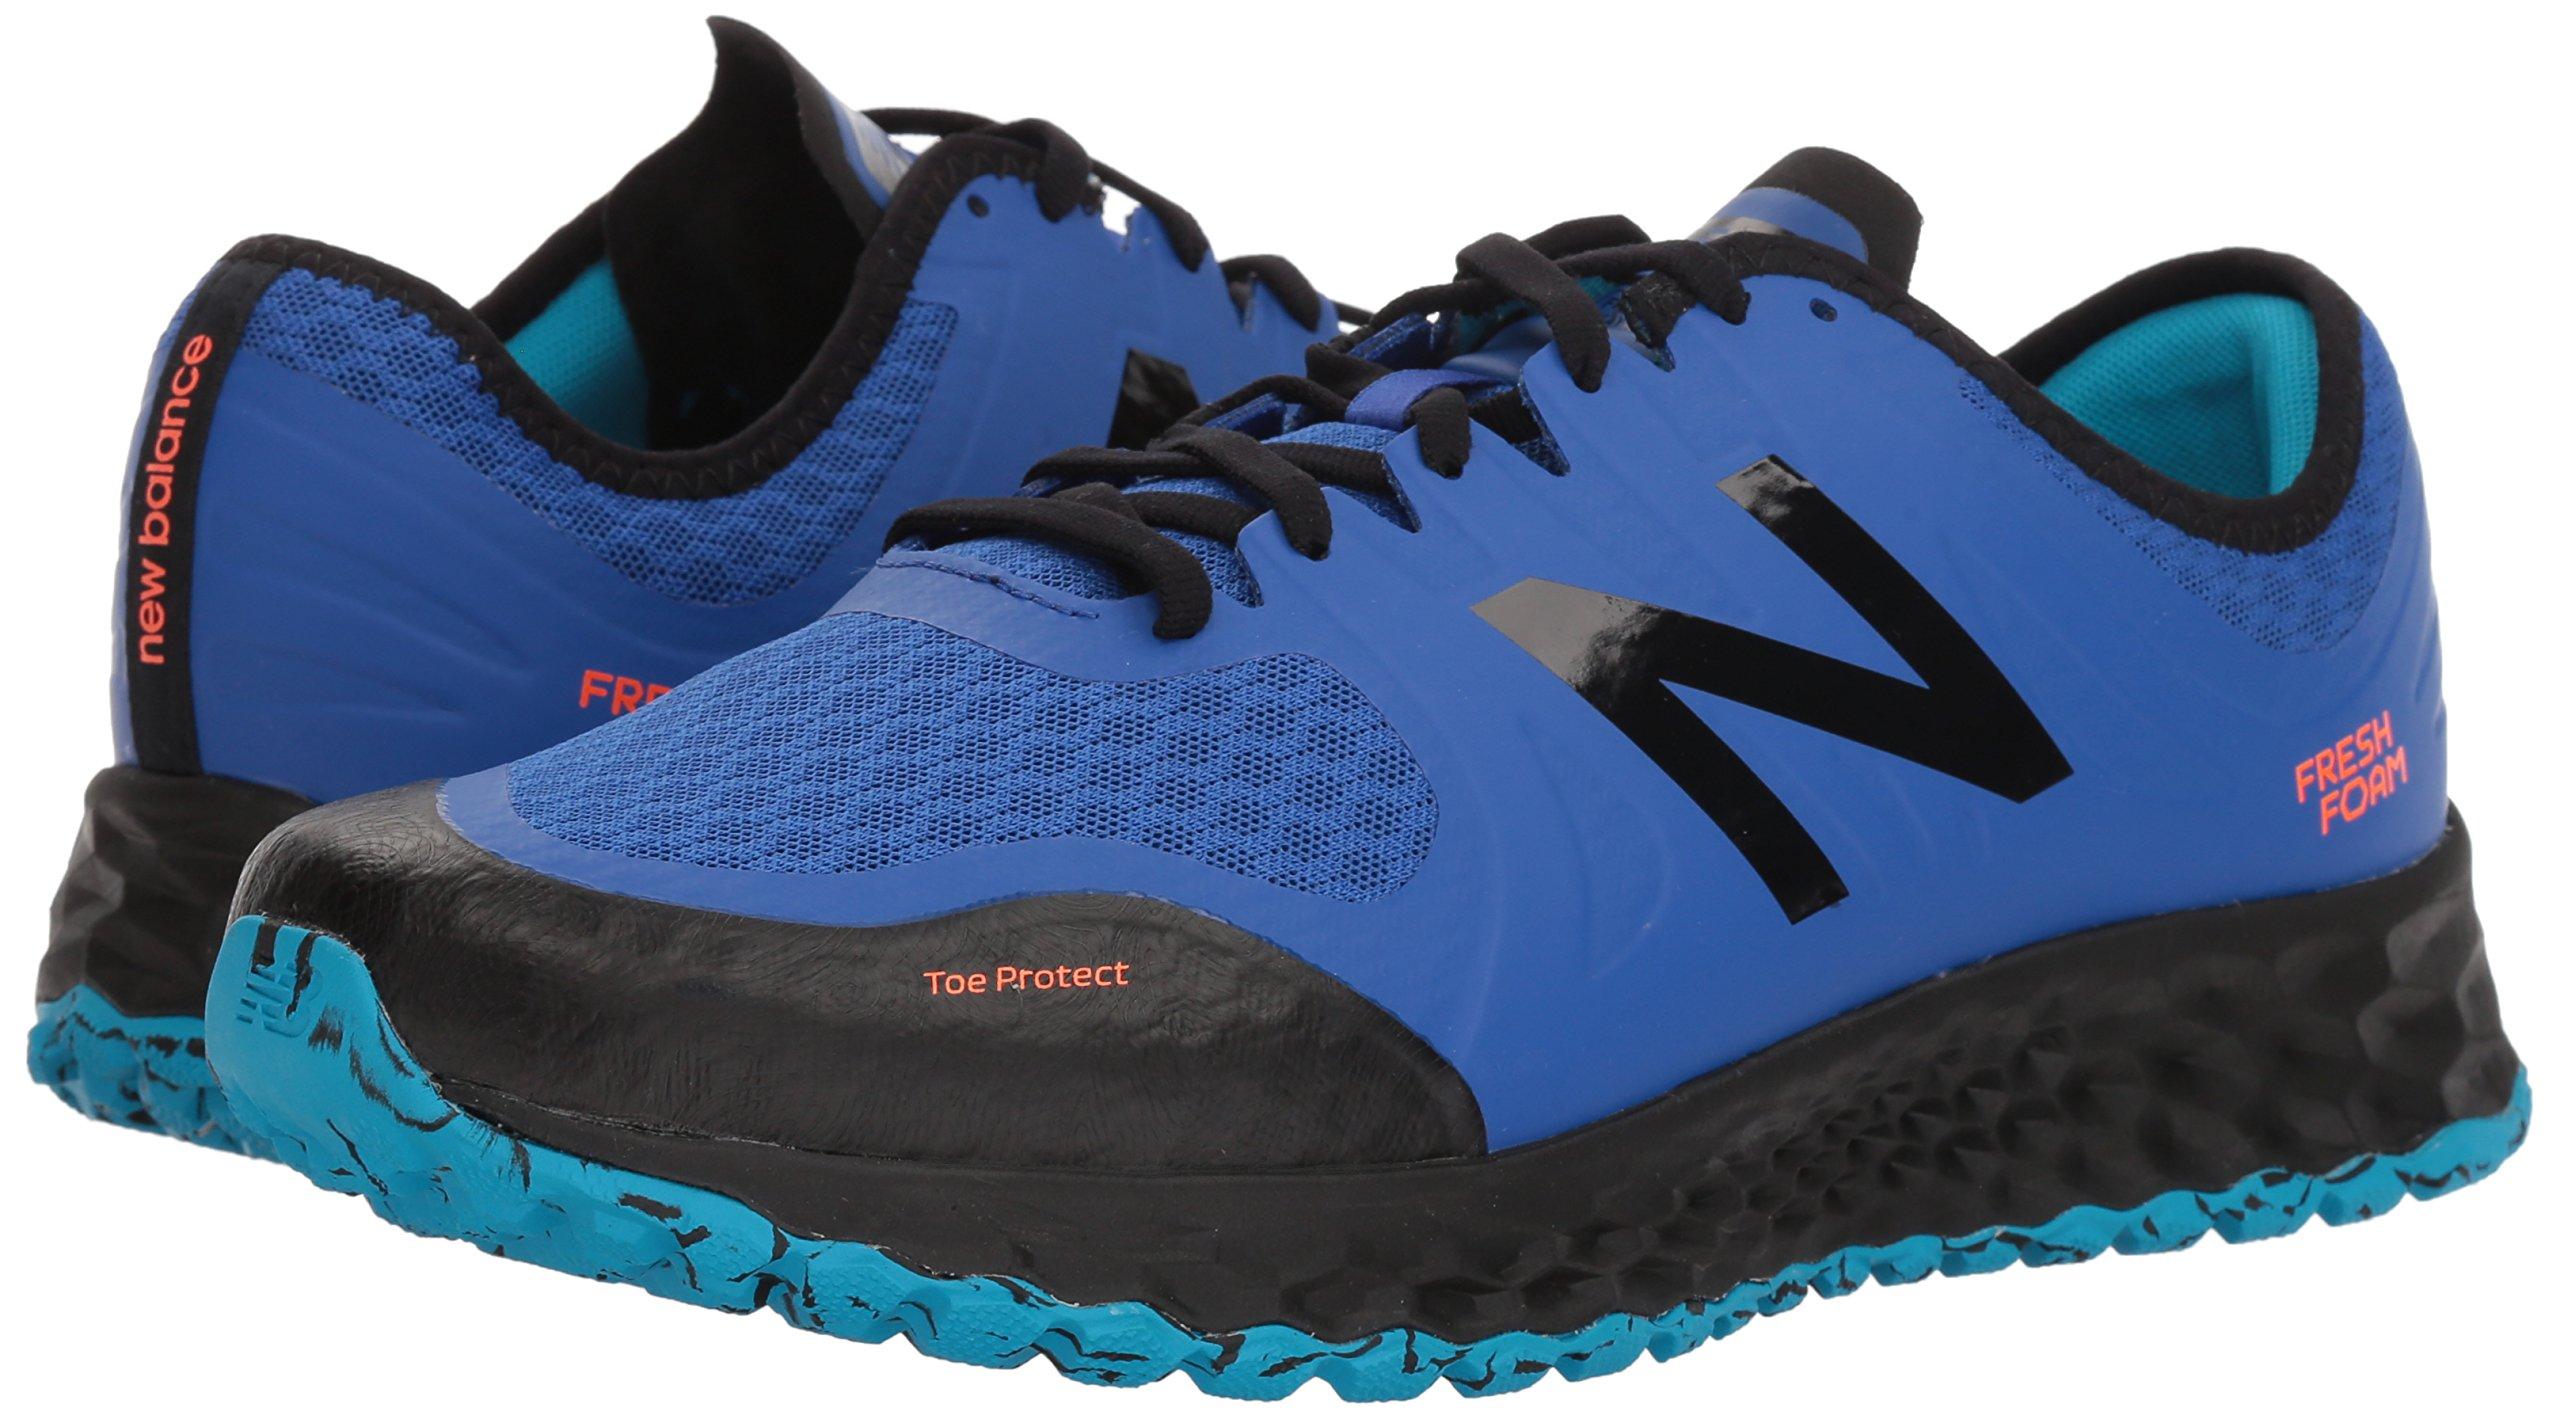 New Balance Men's Kaymin Trail v1 Fresh Foam Trail Running Shoe, Deep Pacific, 7 D US by New Balance (Image #5)